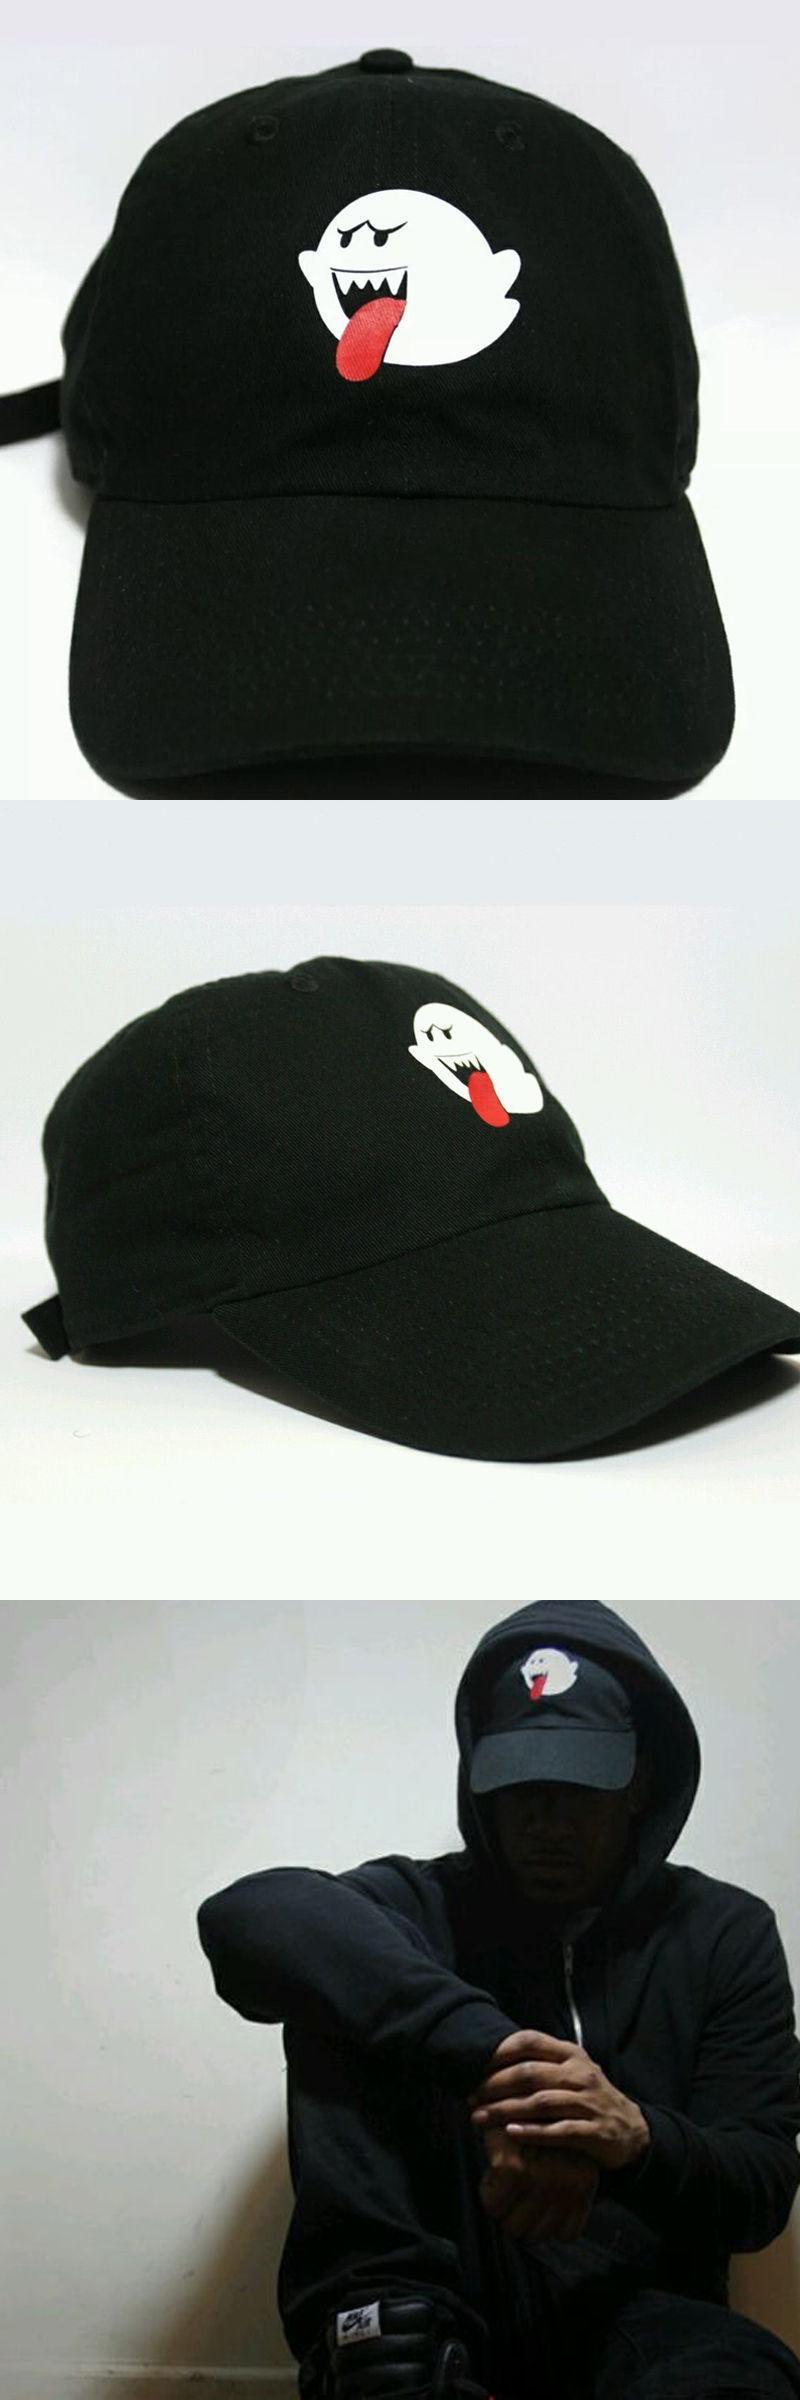 a0485aa9 [Visit to Buy] Bryson Tiller Hat American Rapper Singer Trapsoul Snapback  Hip Hop Dad Hat Distressed Boo Mario Ghost Women Men Baseball Cap  #Advertisement